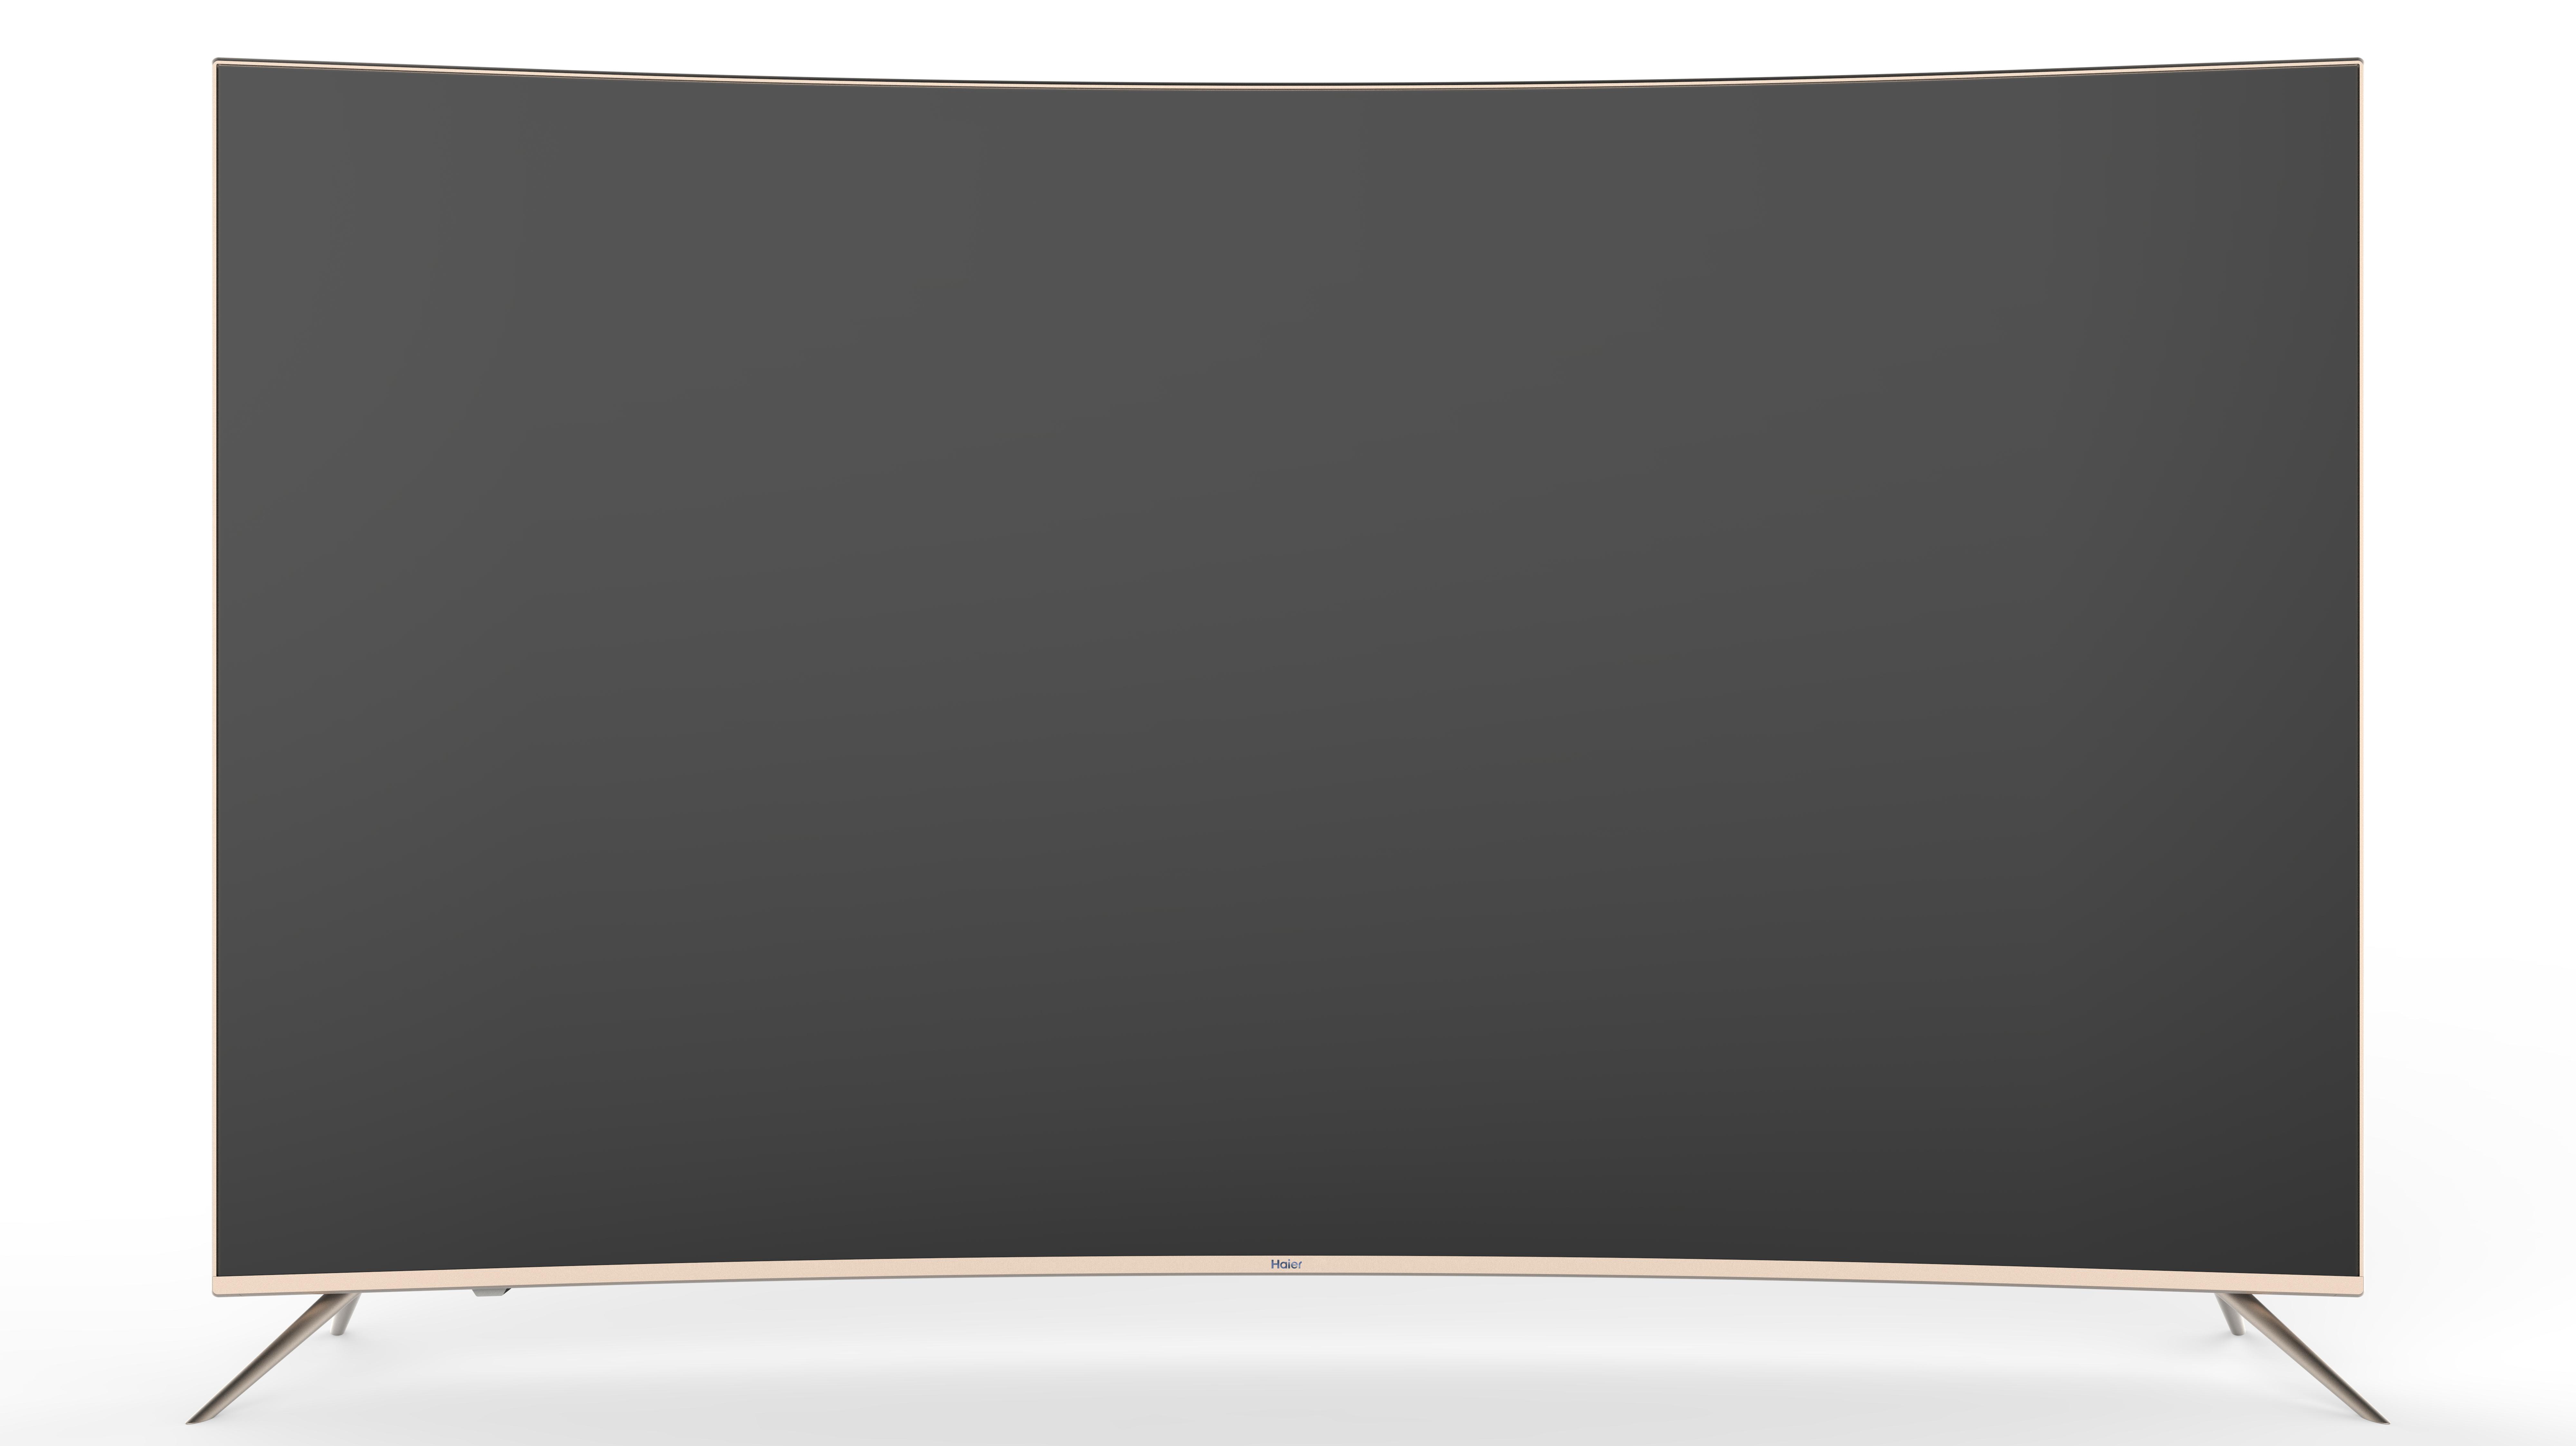 تلویزیون  ال ای دی55اینچ curve  هایر